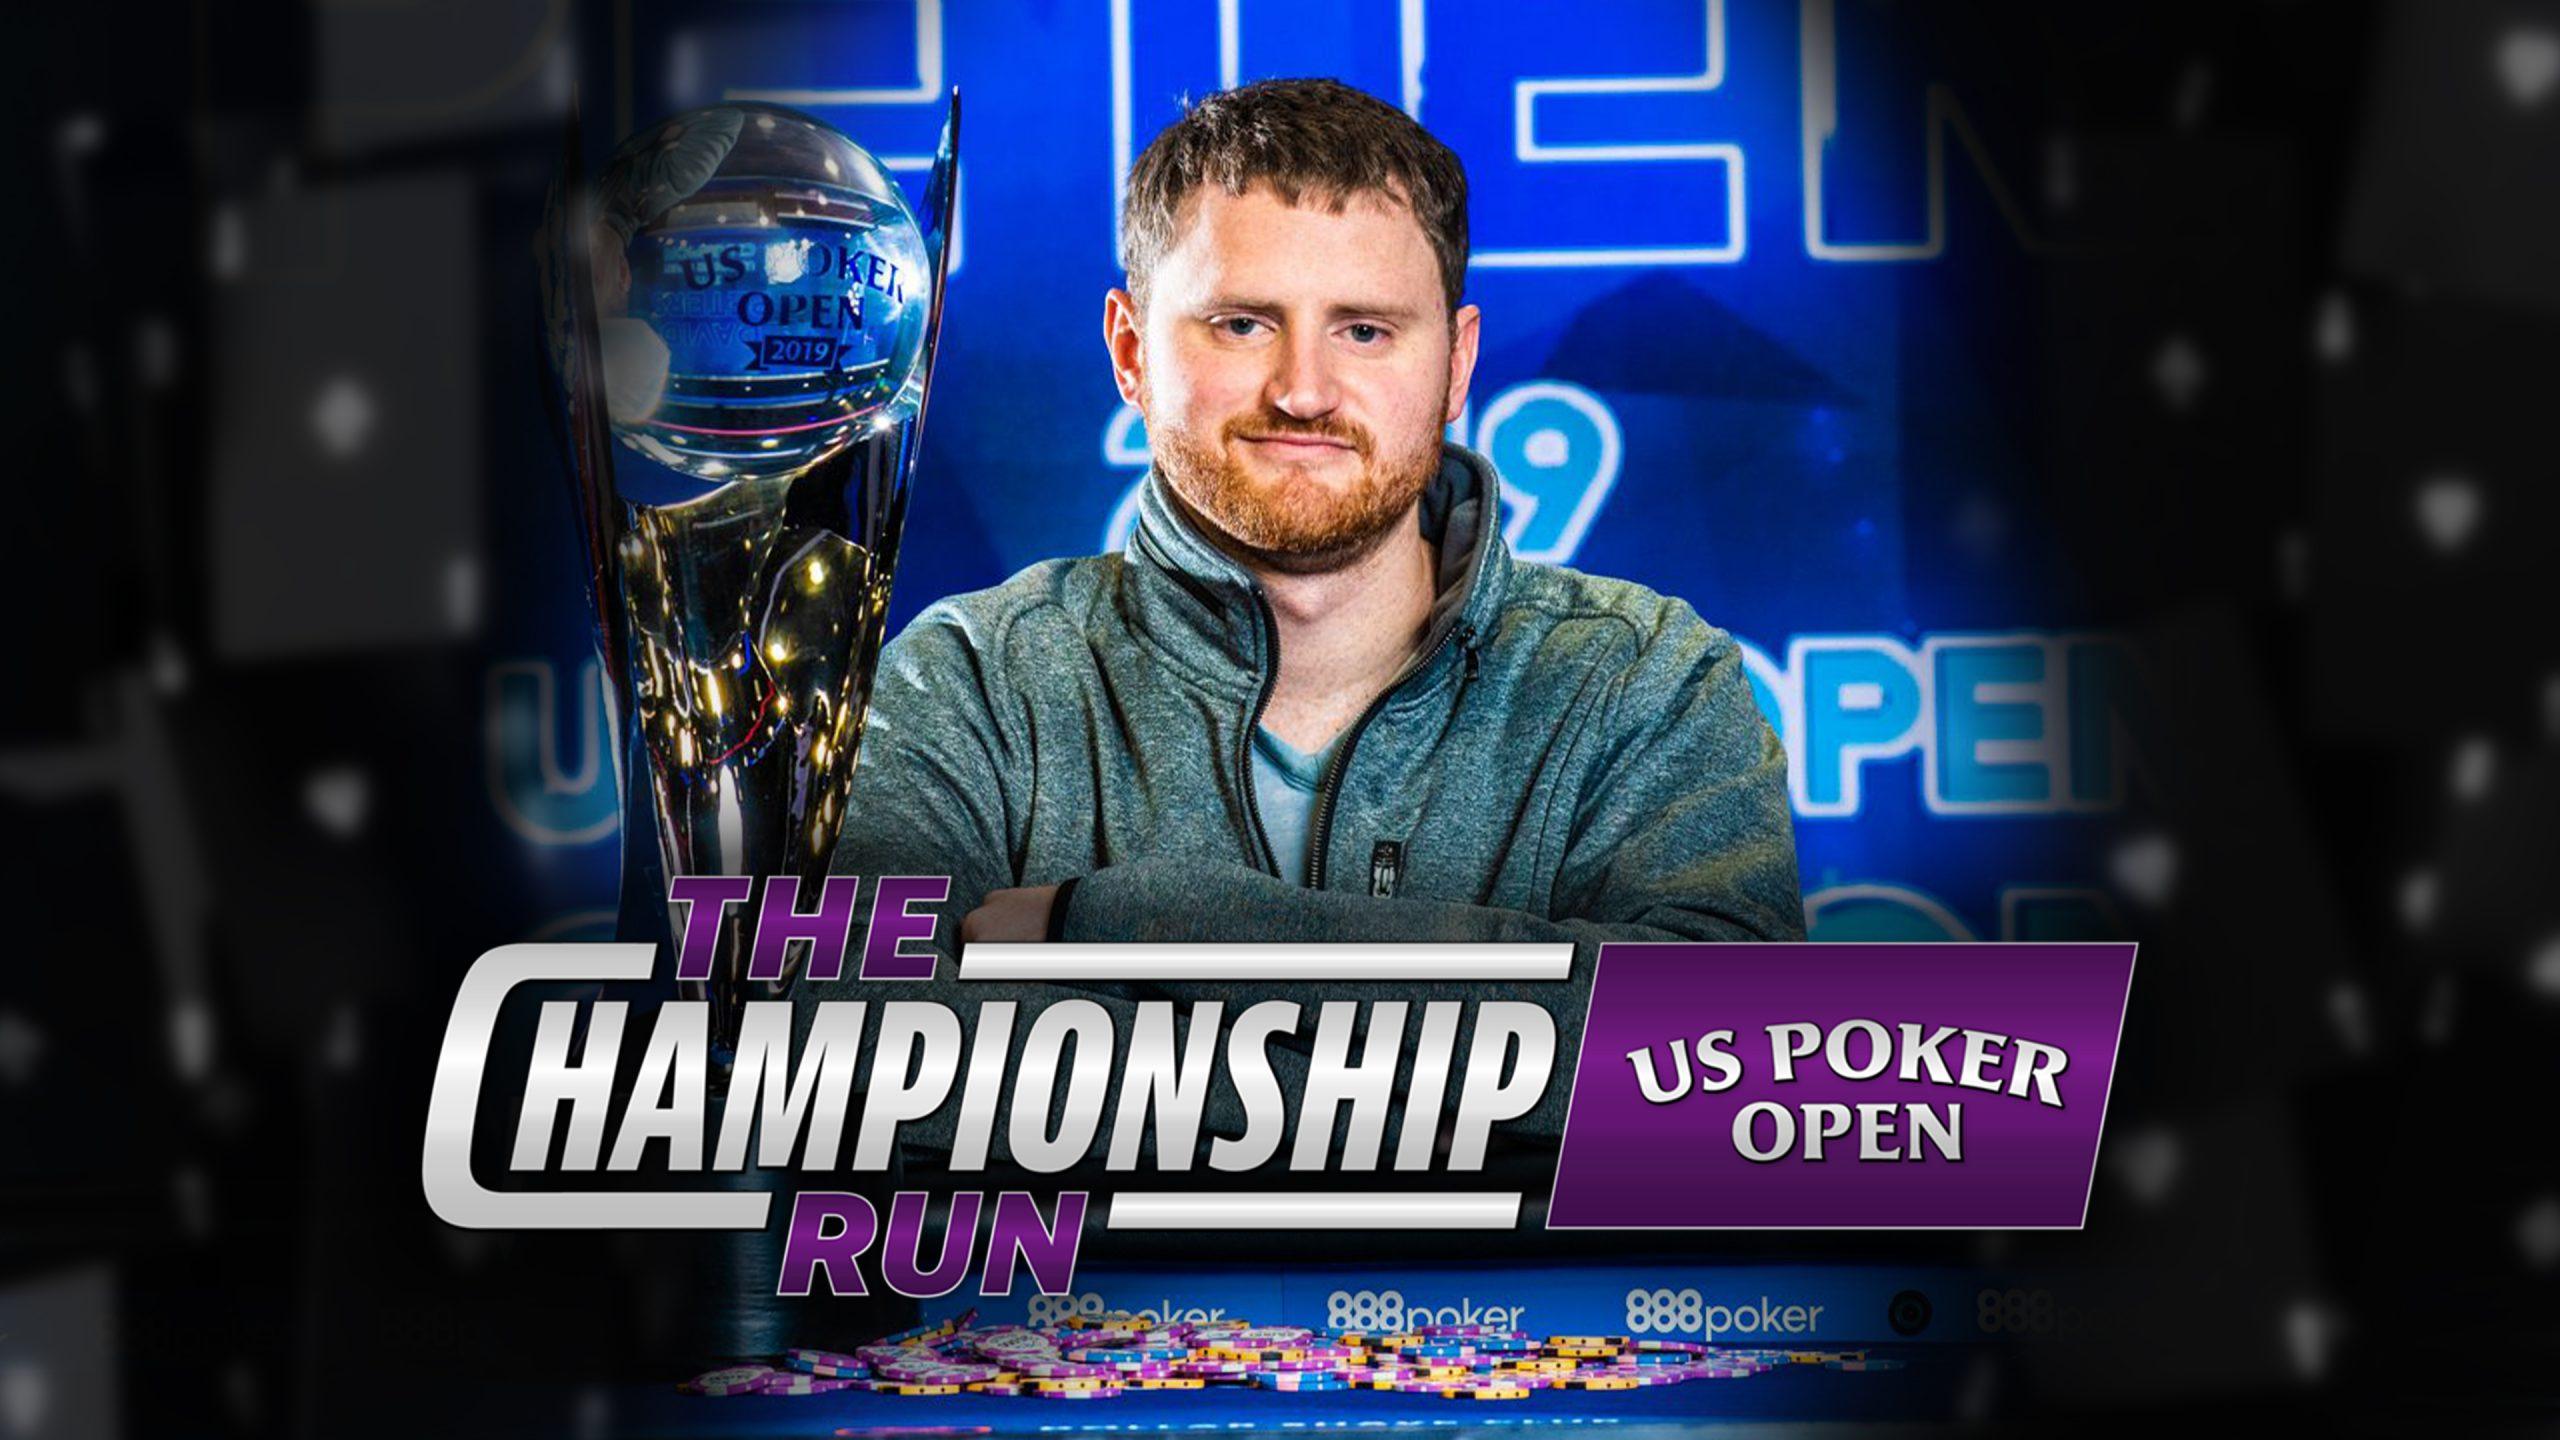 Watch The Championship Run: U.S. Poker Open | David Peters on PokerGO Now!